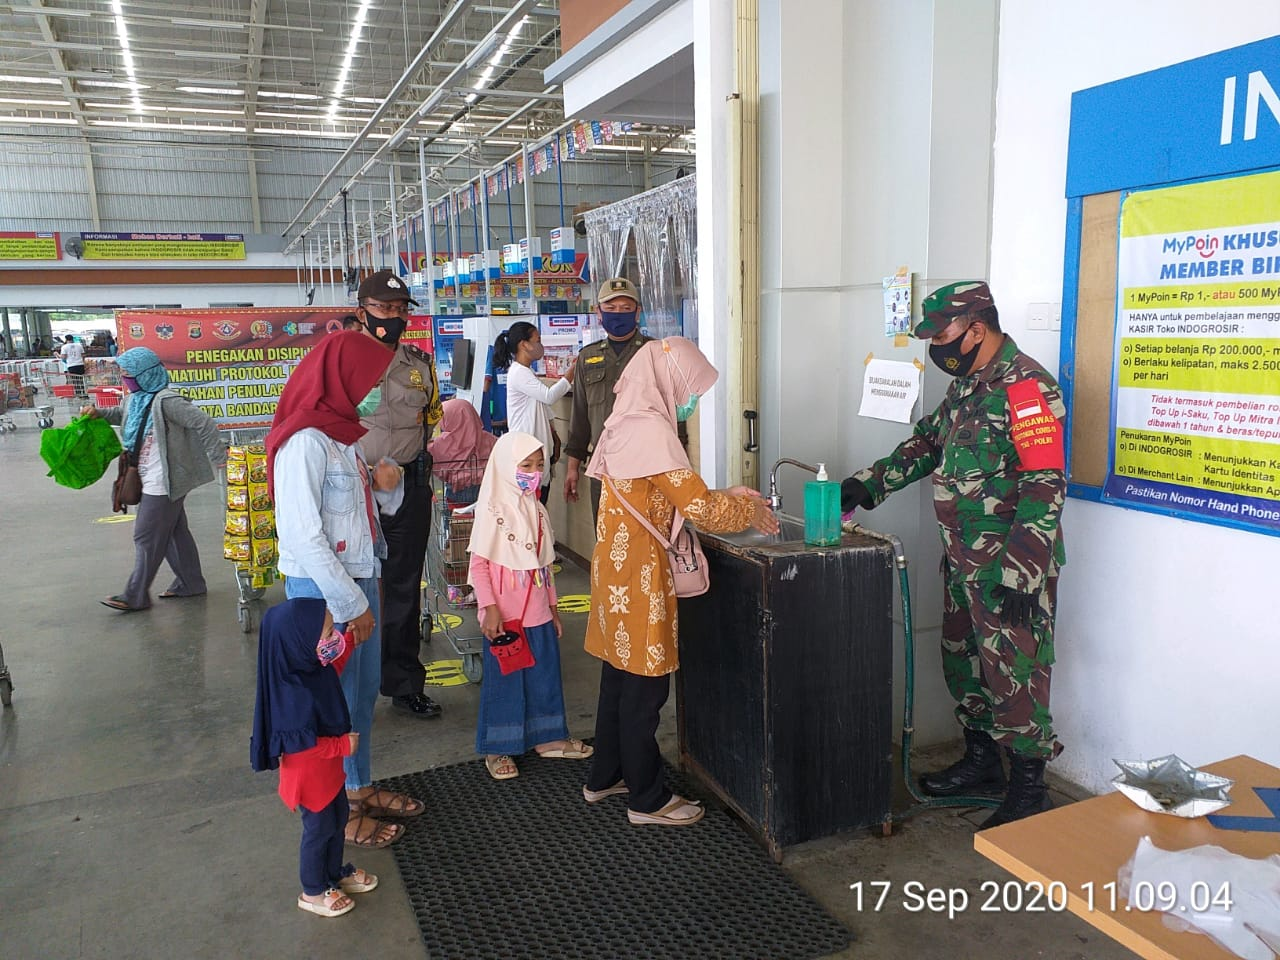 Satgas terpadu percepatan Penanganan Covid19 KBL laksanakan penegakan disiplin protokol kesehatan di Indogrosir Labuhan Ratu